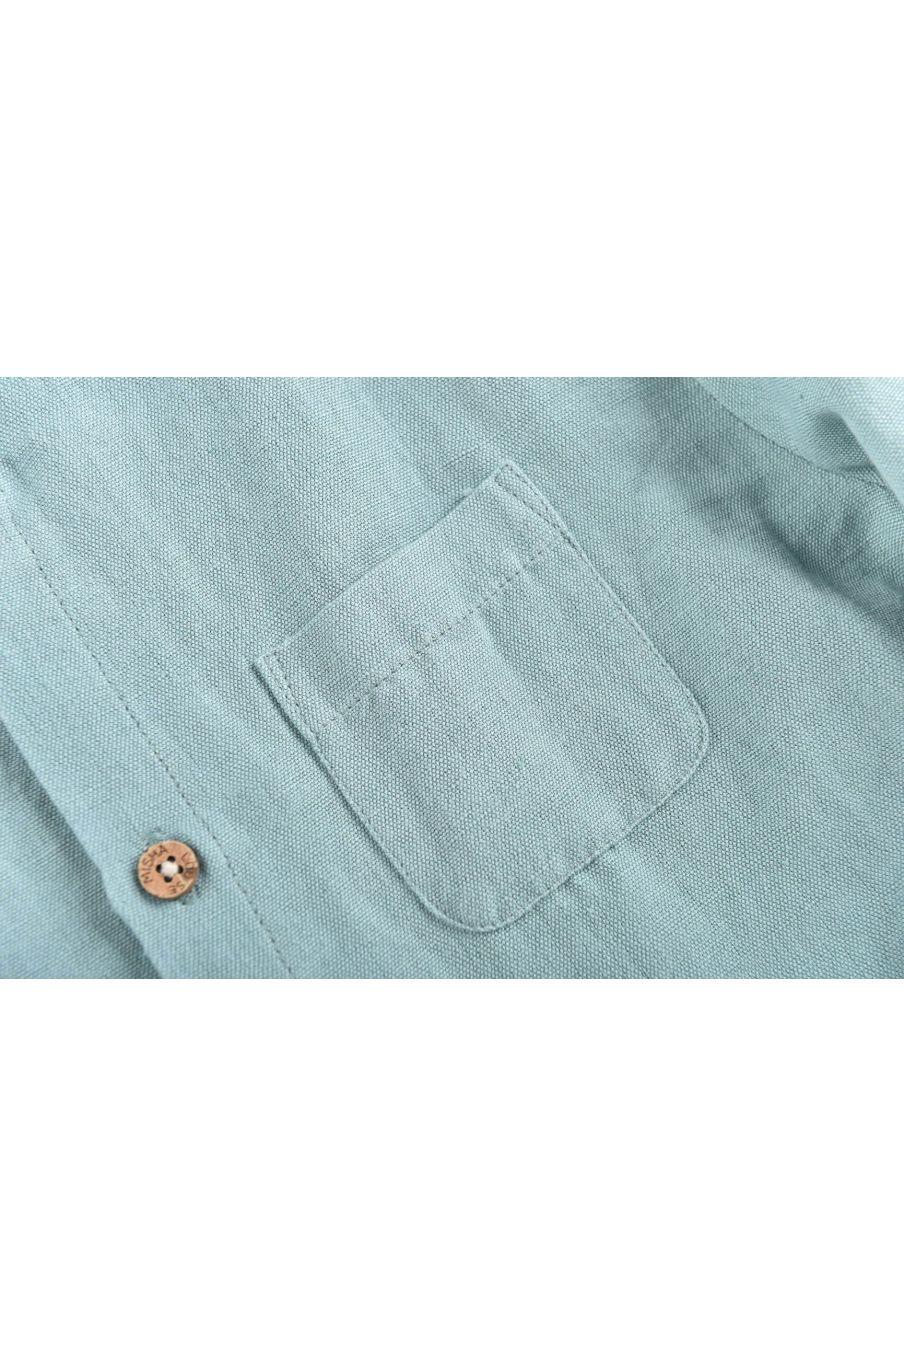 boheme chic vintage chemise garcon amod vintage blue